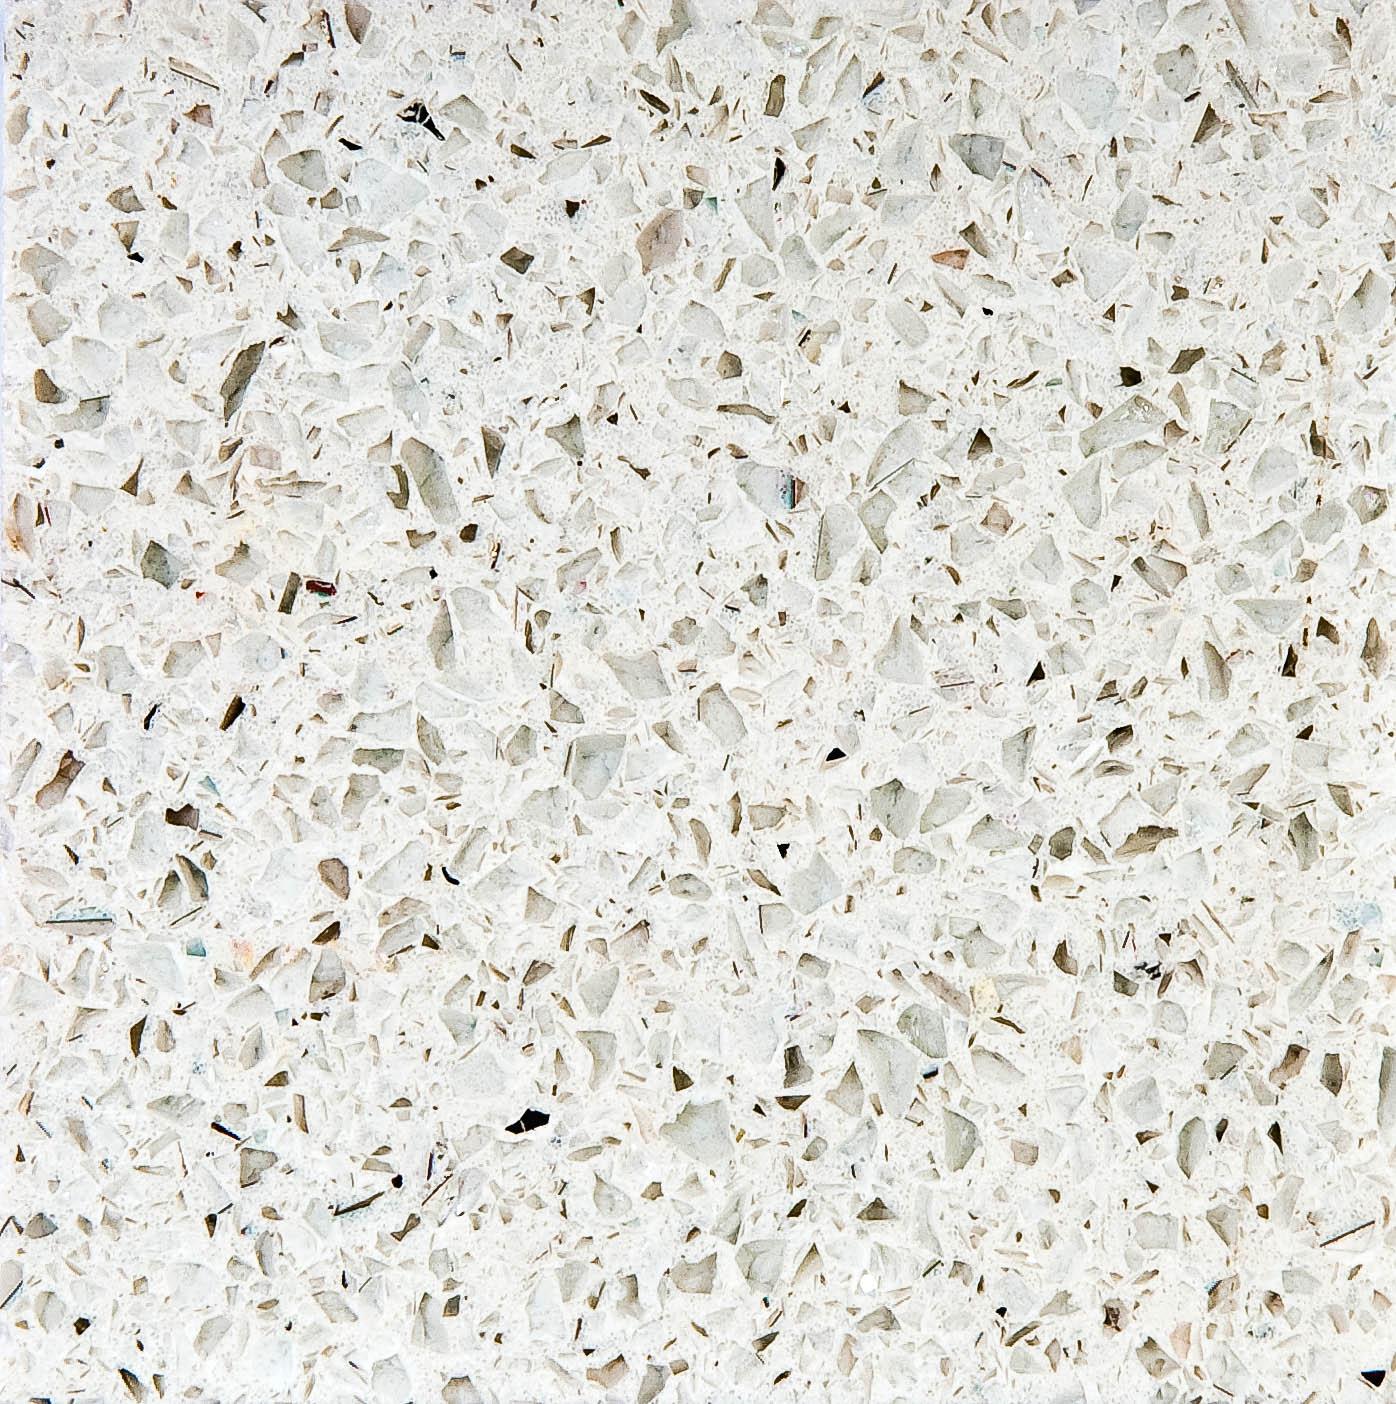 Artificial Granite Regal White KLEEMANN – Alexiou Group